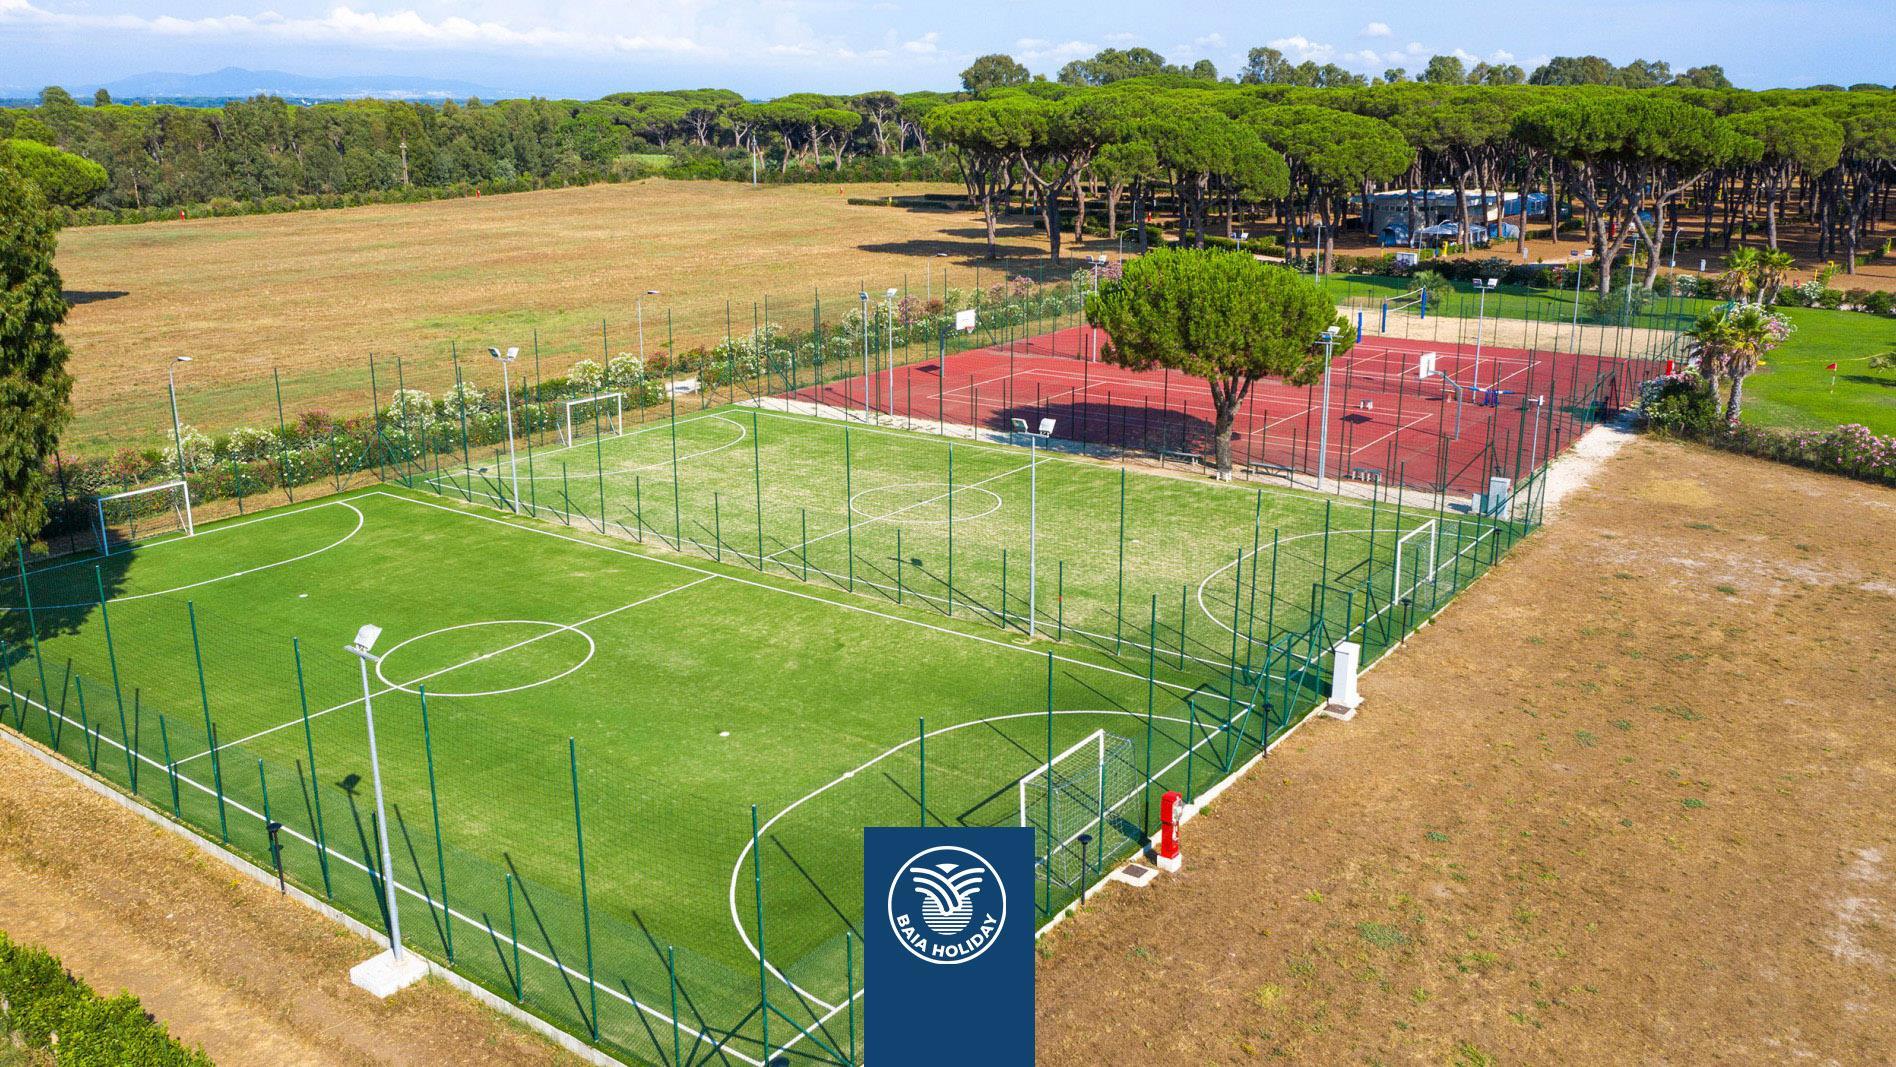 Sport Tennis Voetbal Handbal Gazon